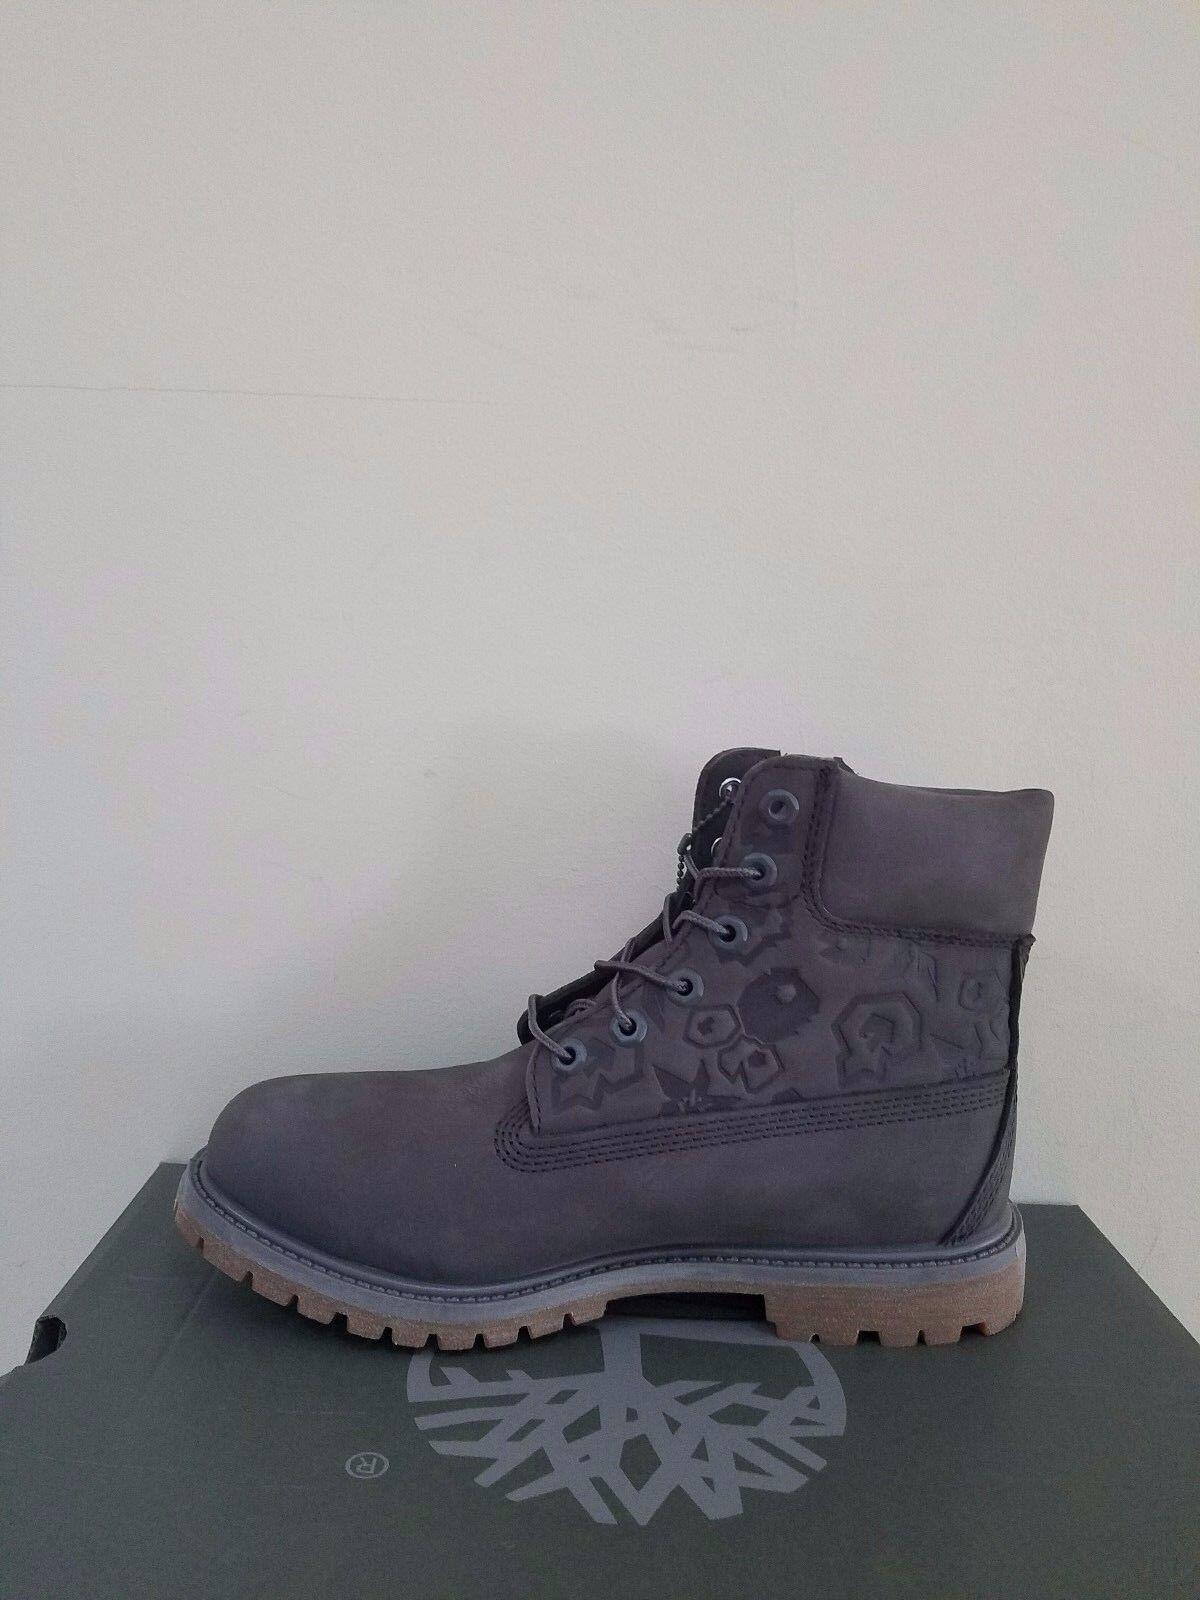 "Timberland Women's Embossed 6 inch"" Double Sole Premium Waterproof Boots NIB 1"